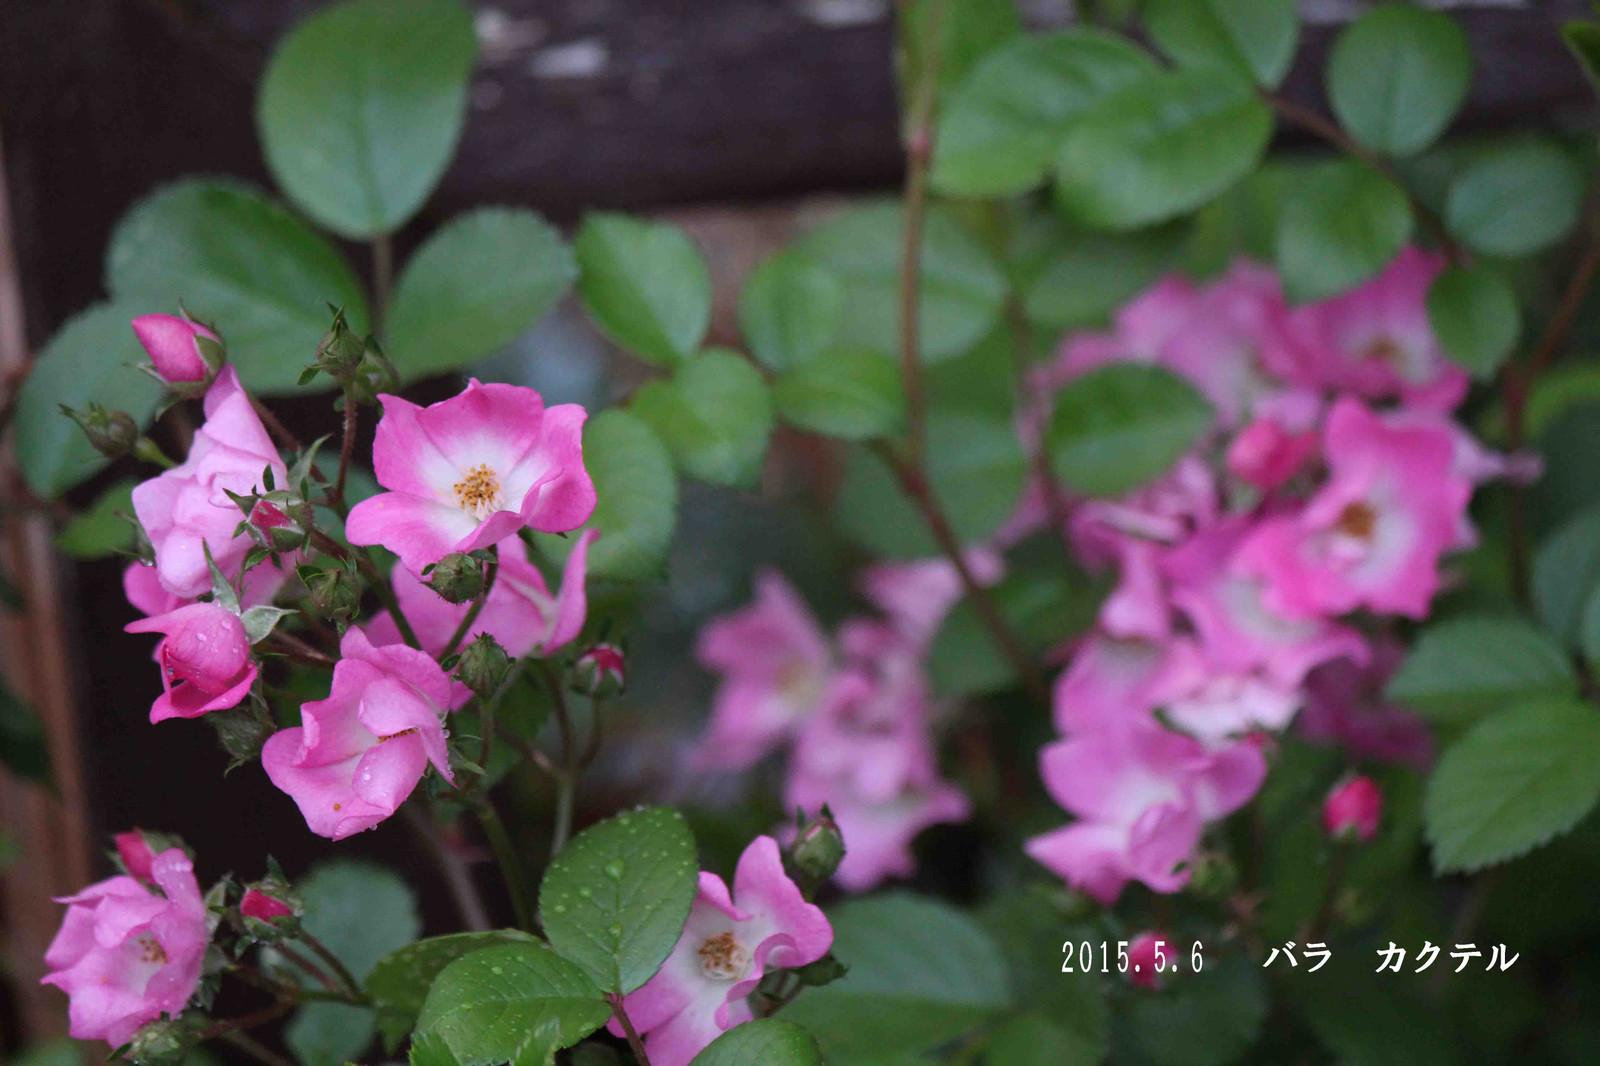 2015_05_06_9108_edited1